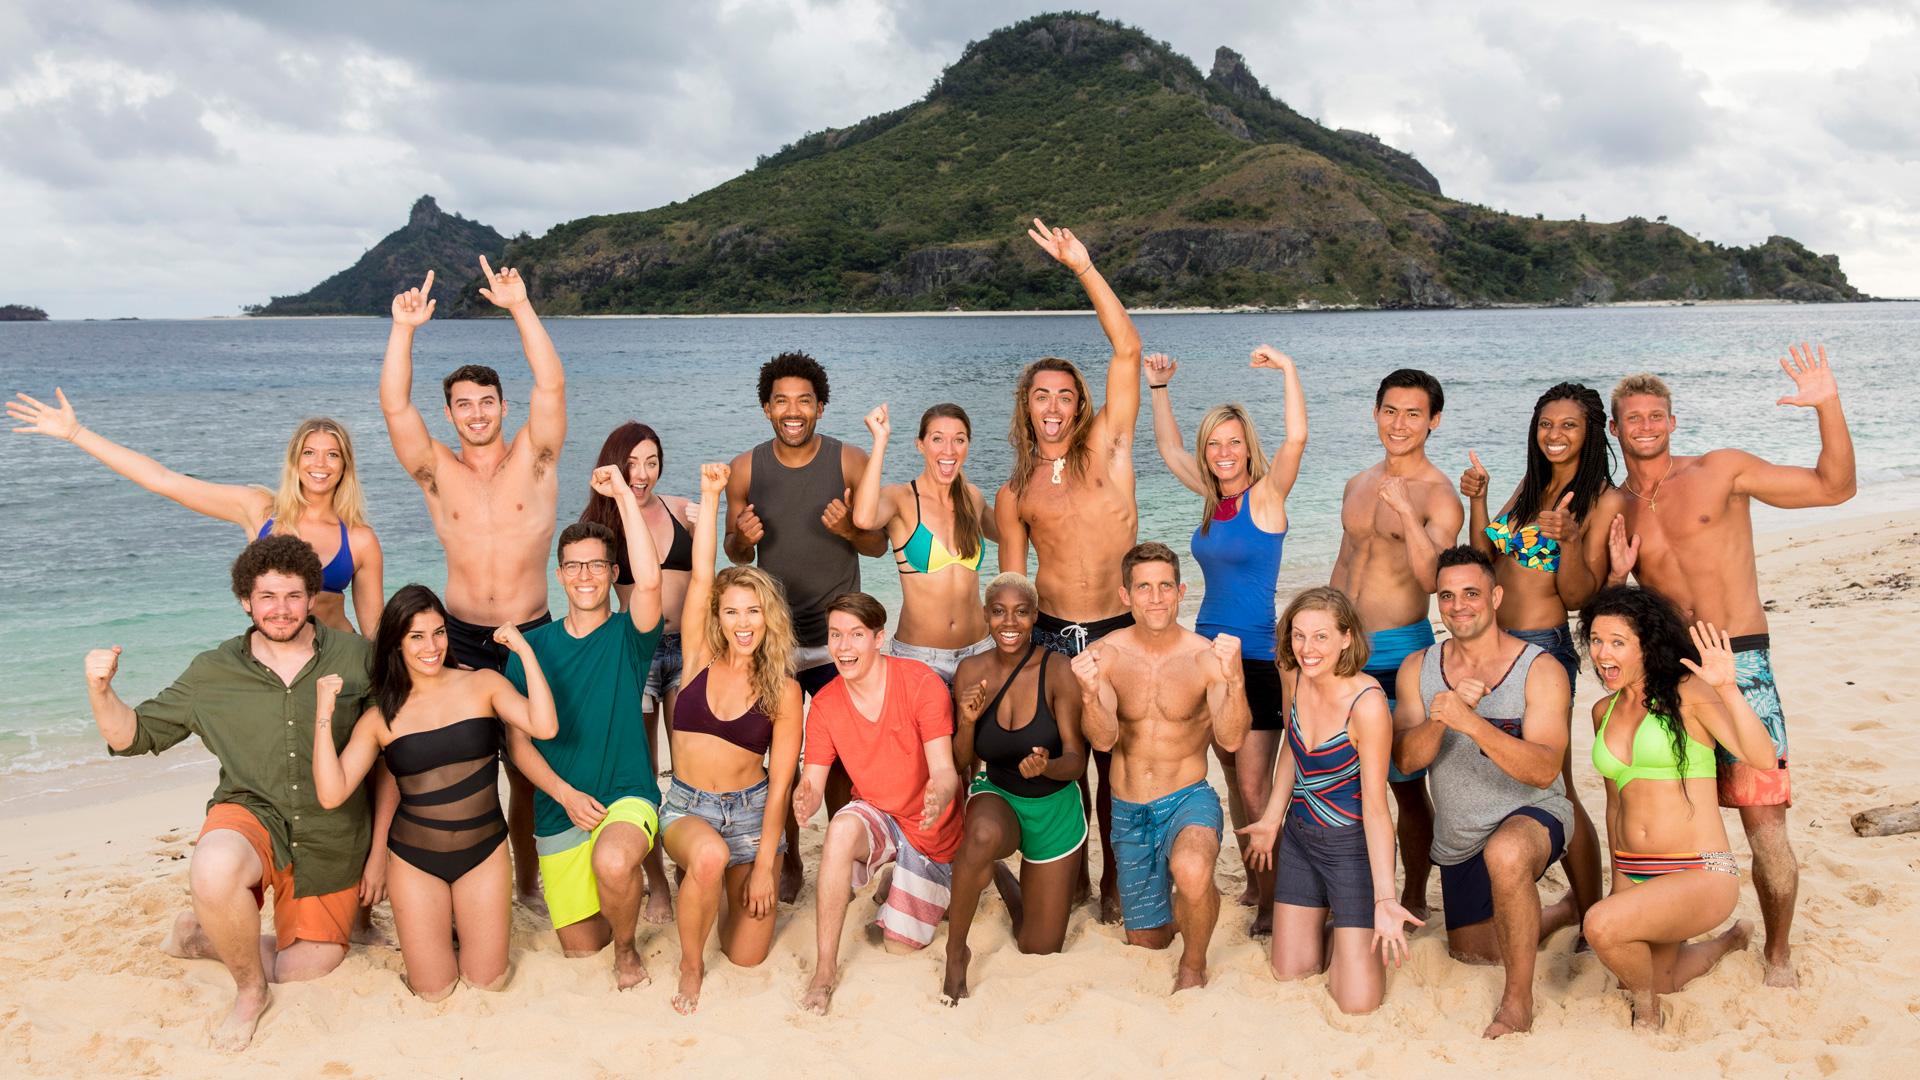 Meet the castaways of Survivor: Ghost Island